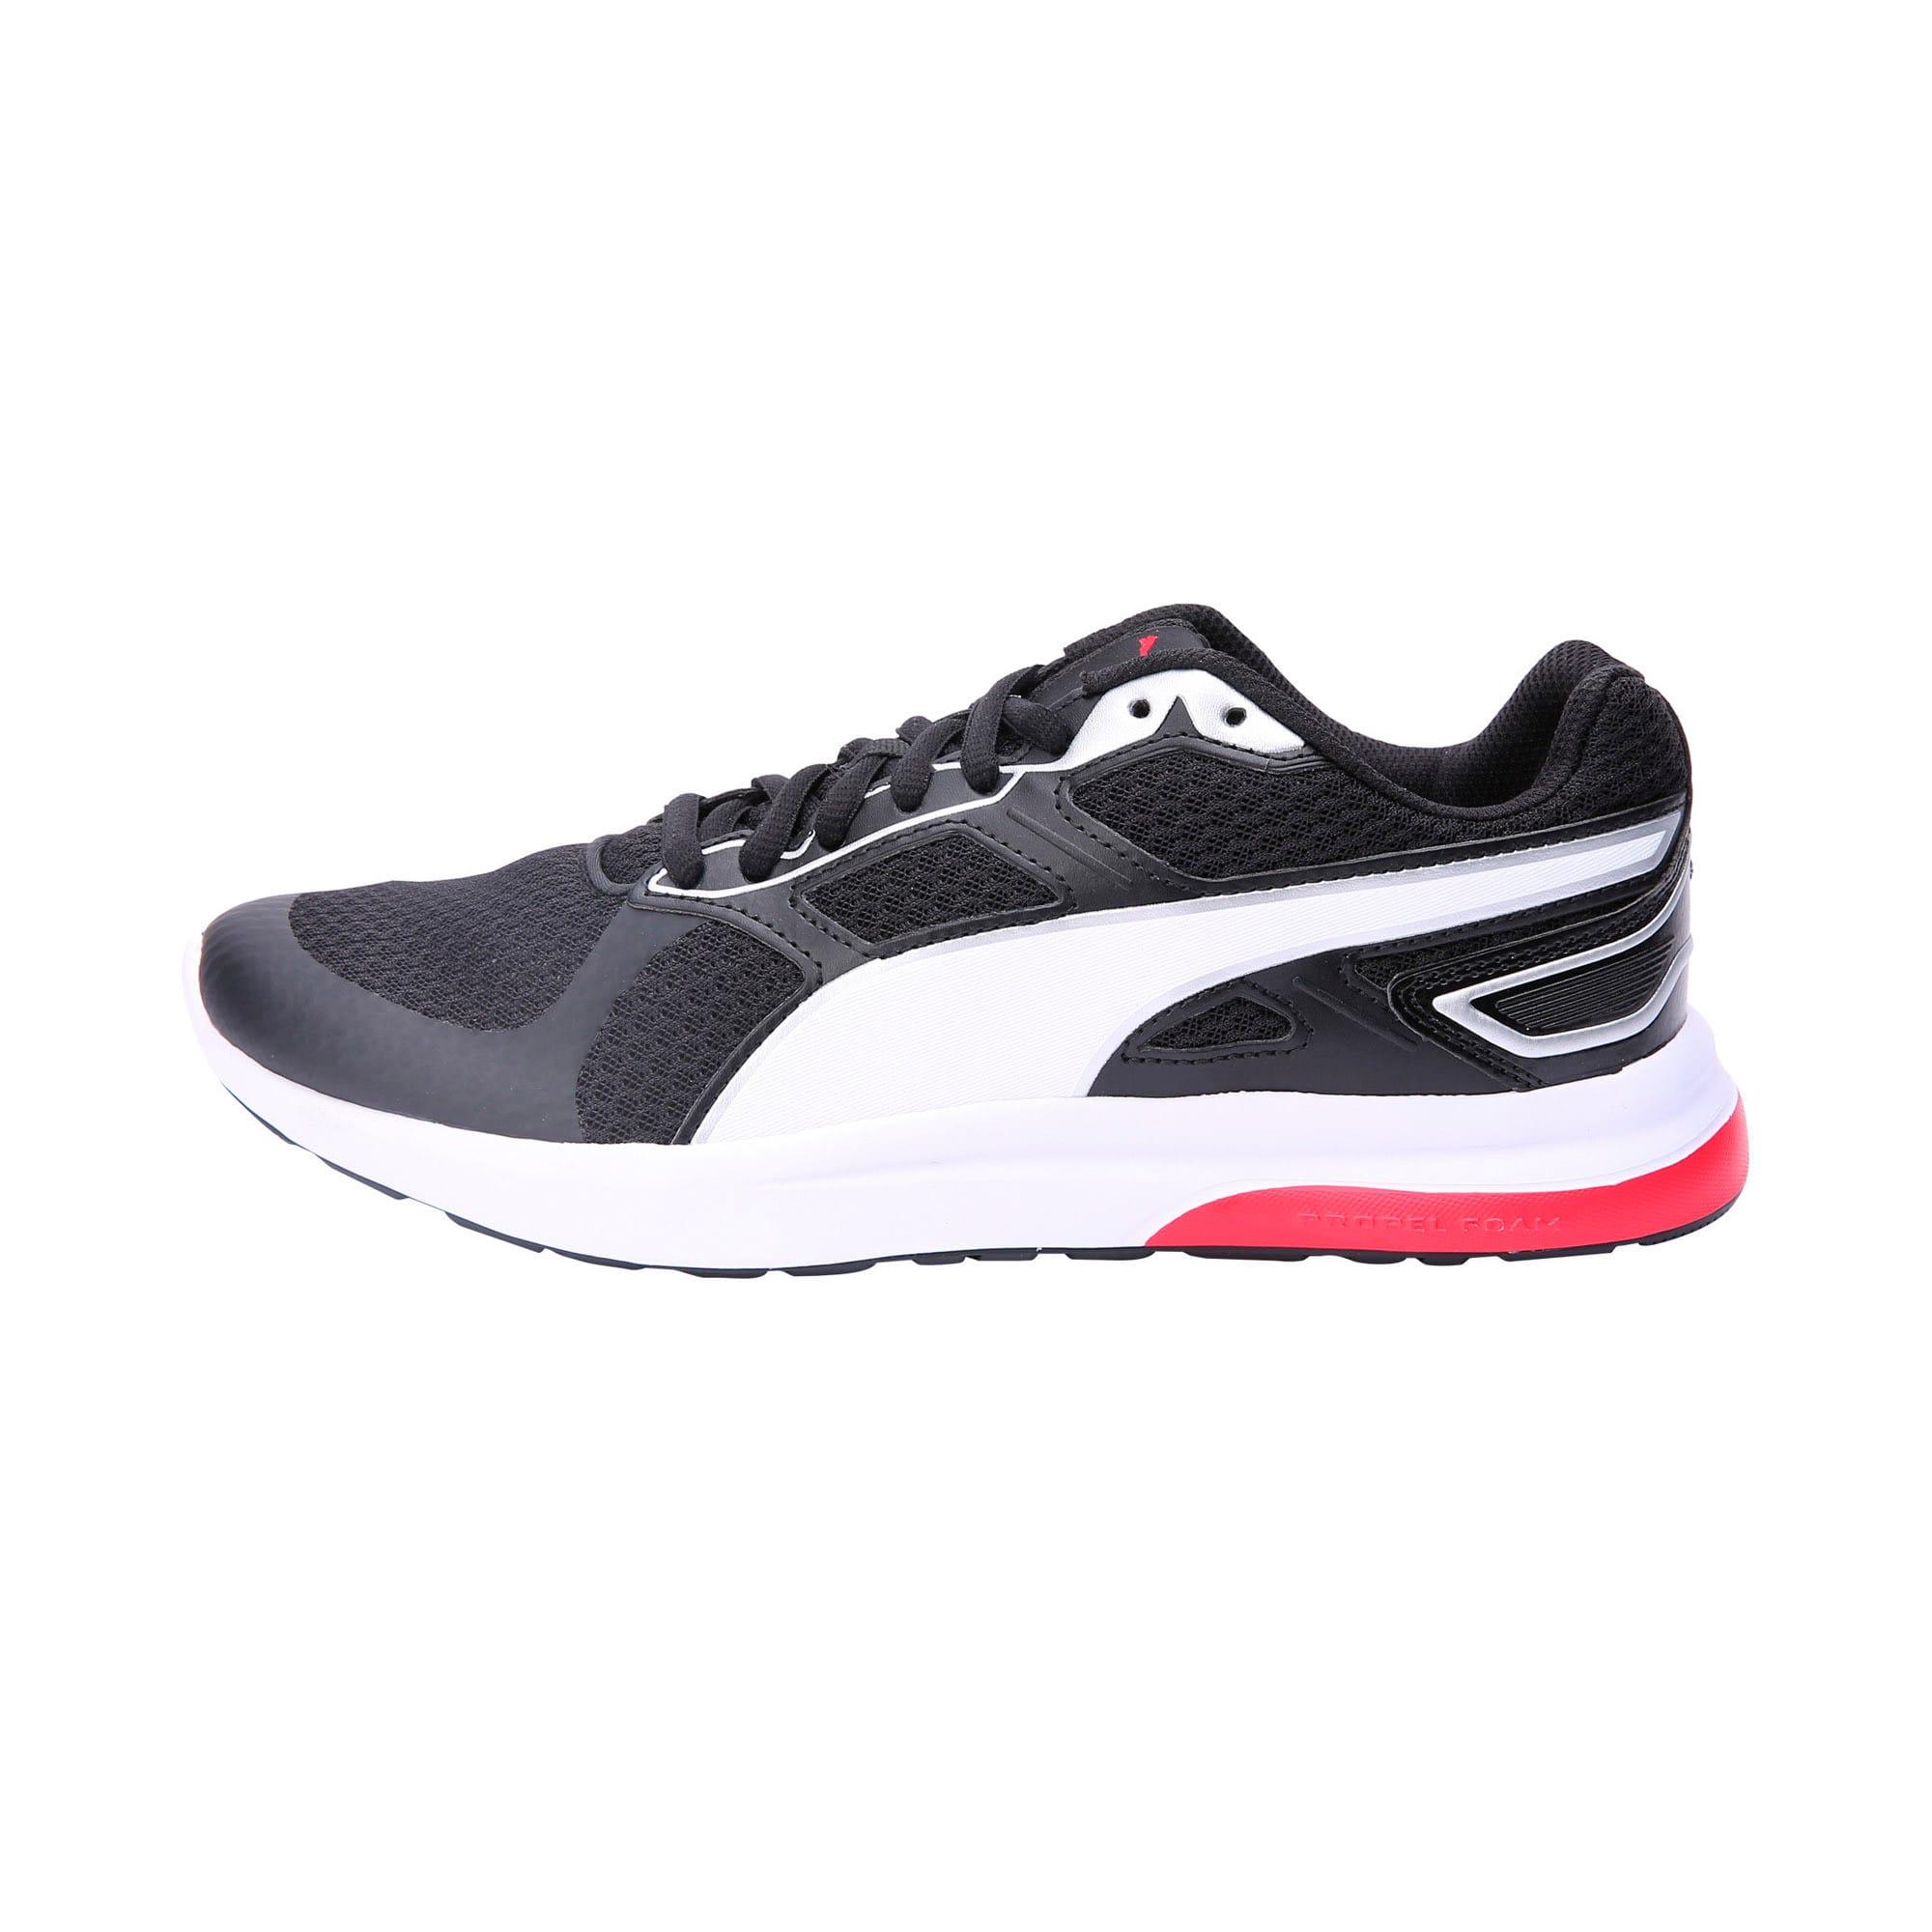 Thumbnail 1 of Escaper Tech Sneakers, P. Black-P. White-Fl.Scarlet, medium-IND